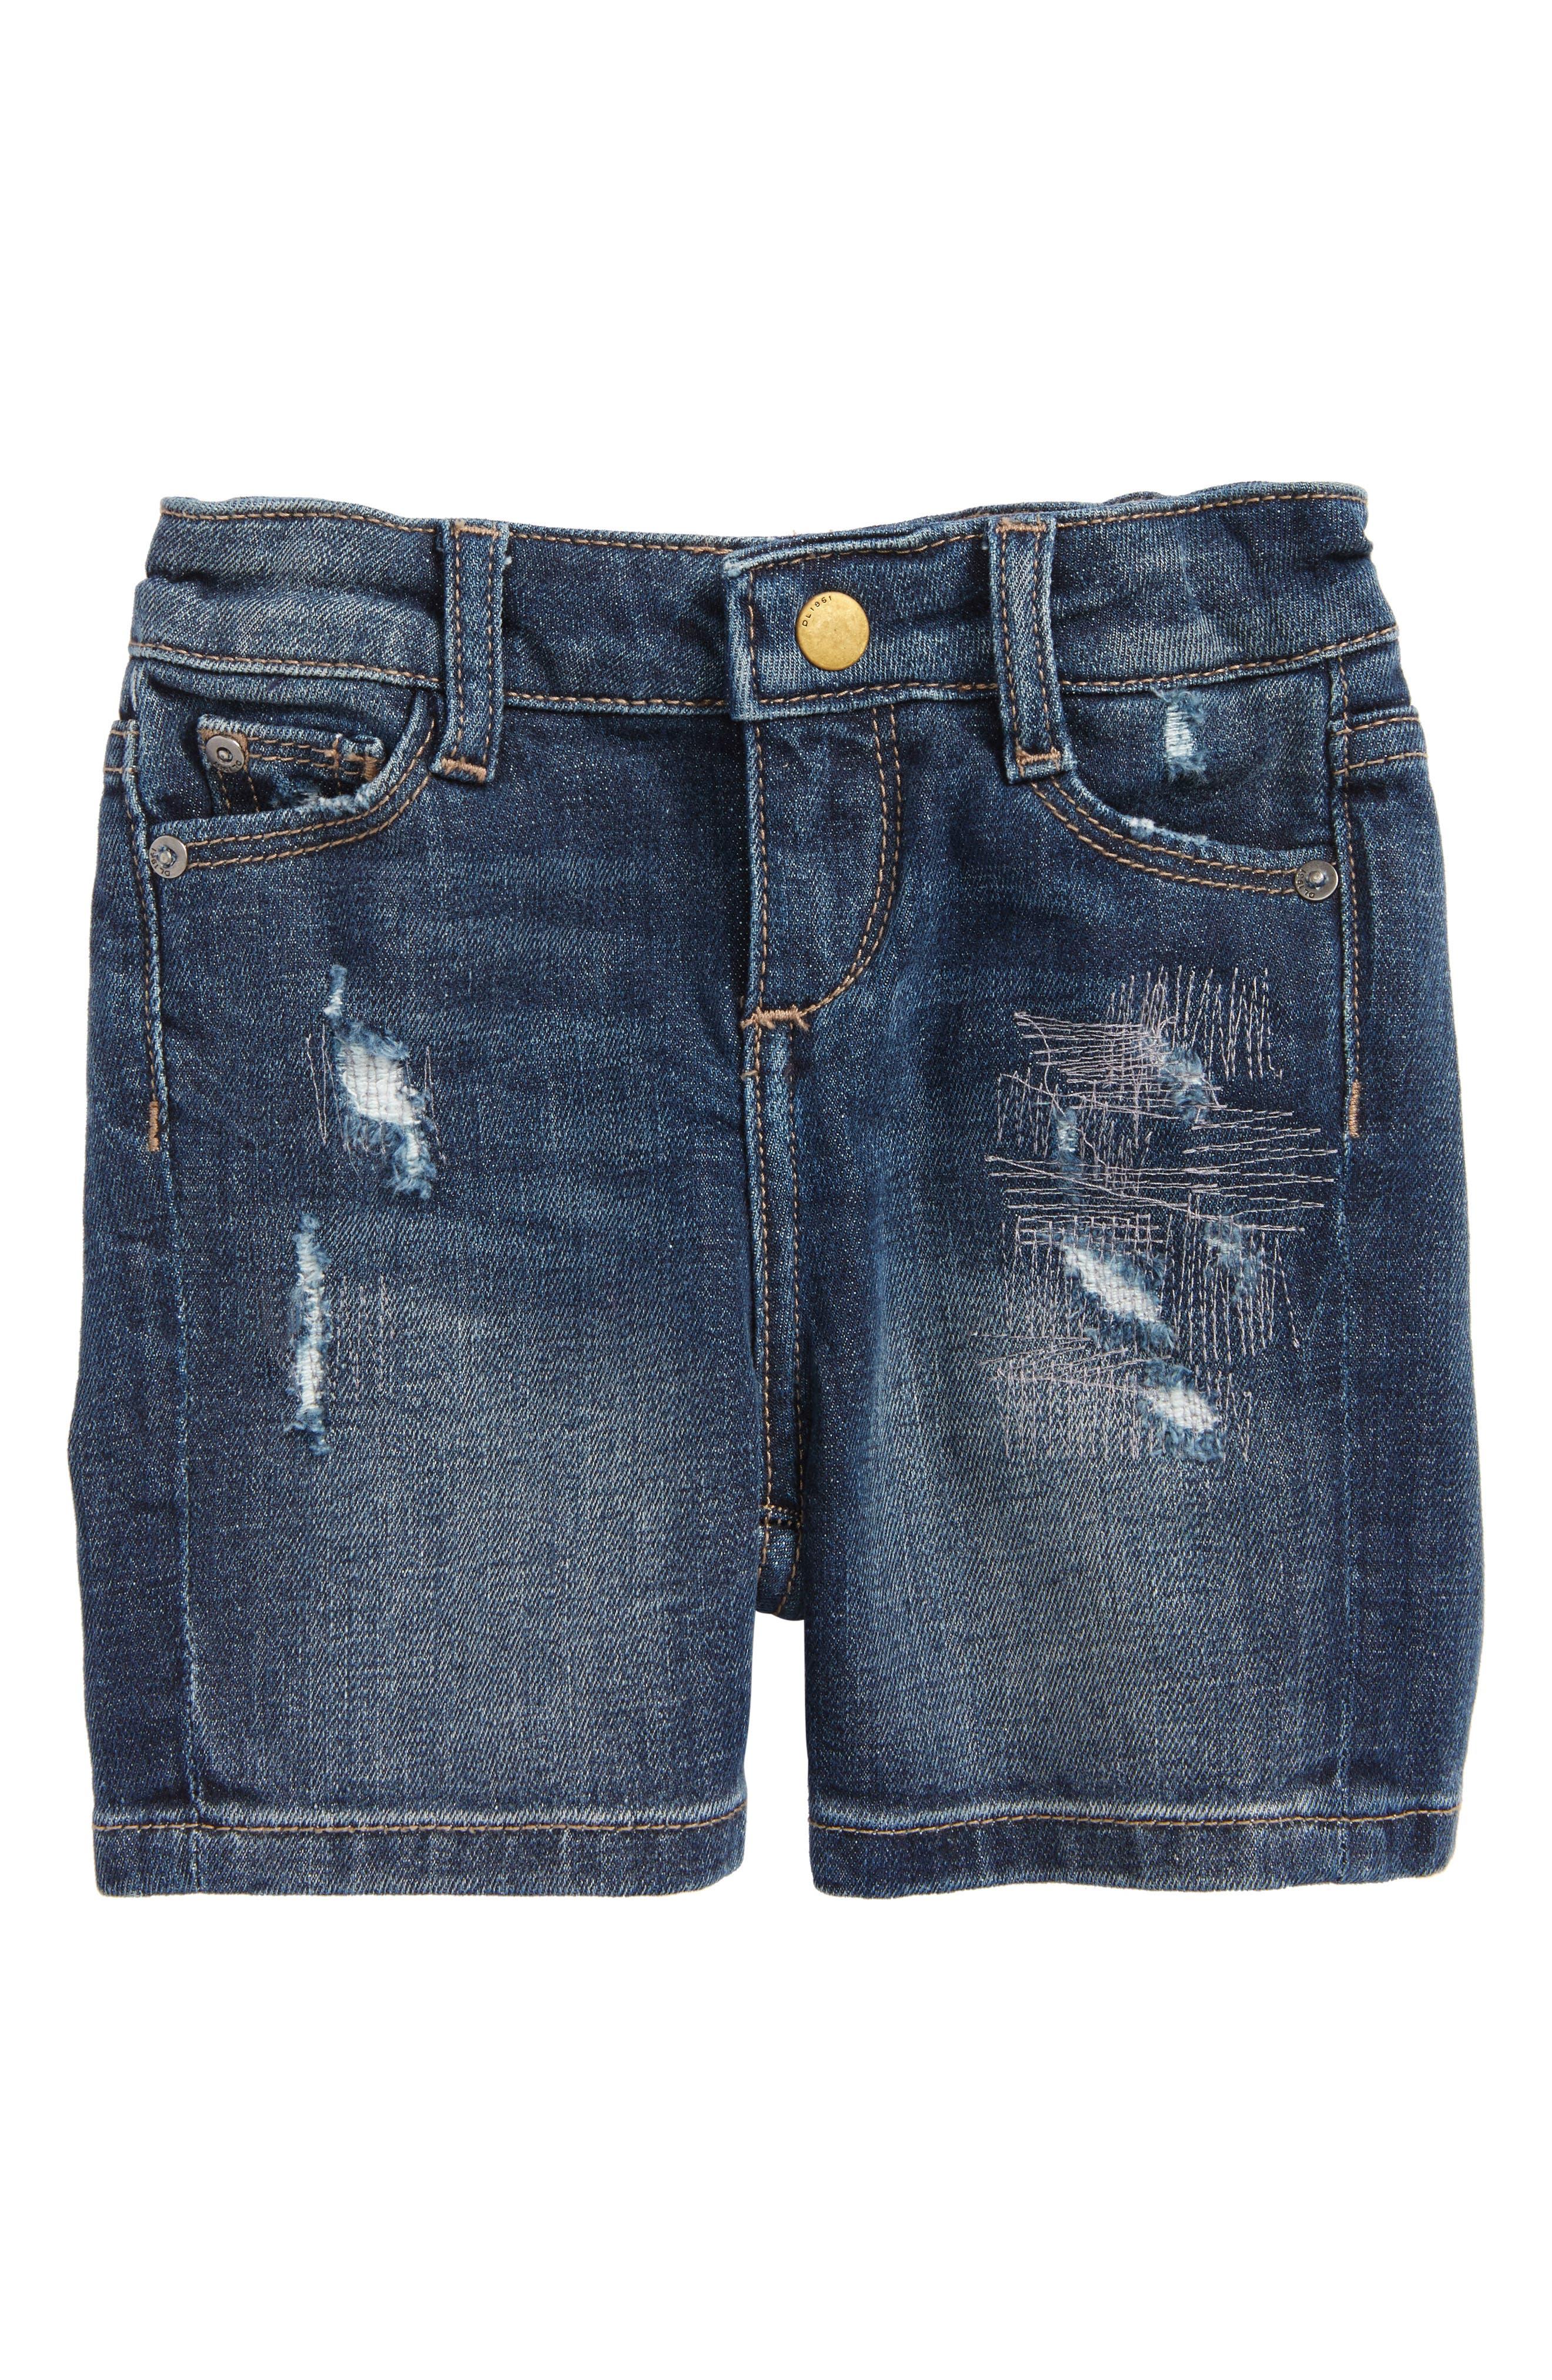 Kaley Denim Shorts,                         Main,                         color, Liberty